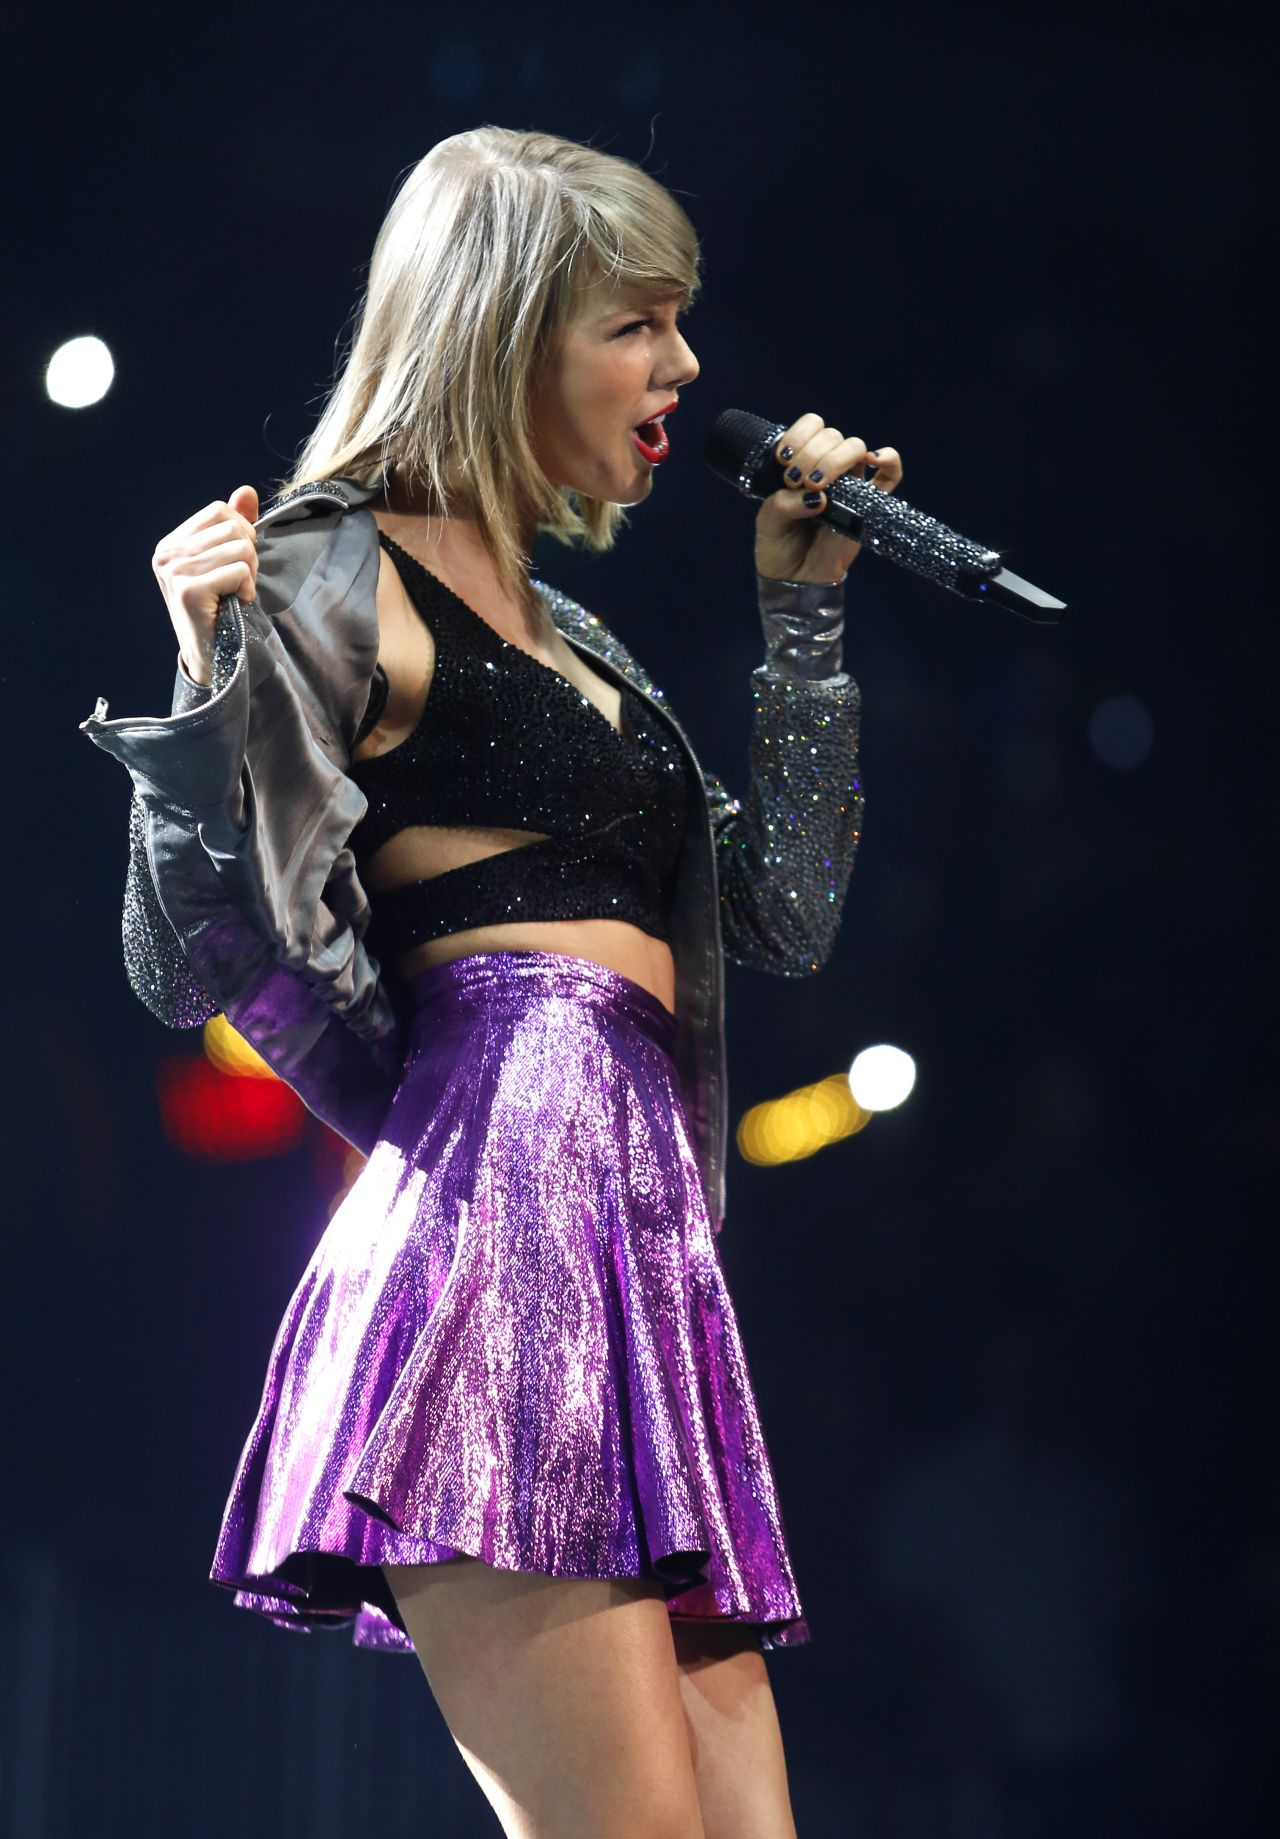 Taylor Swift 1989 World Tour Louisville Concert June 2015